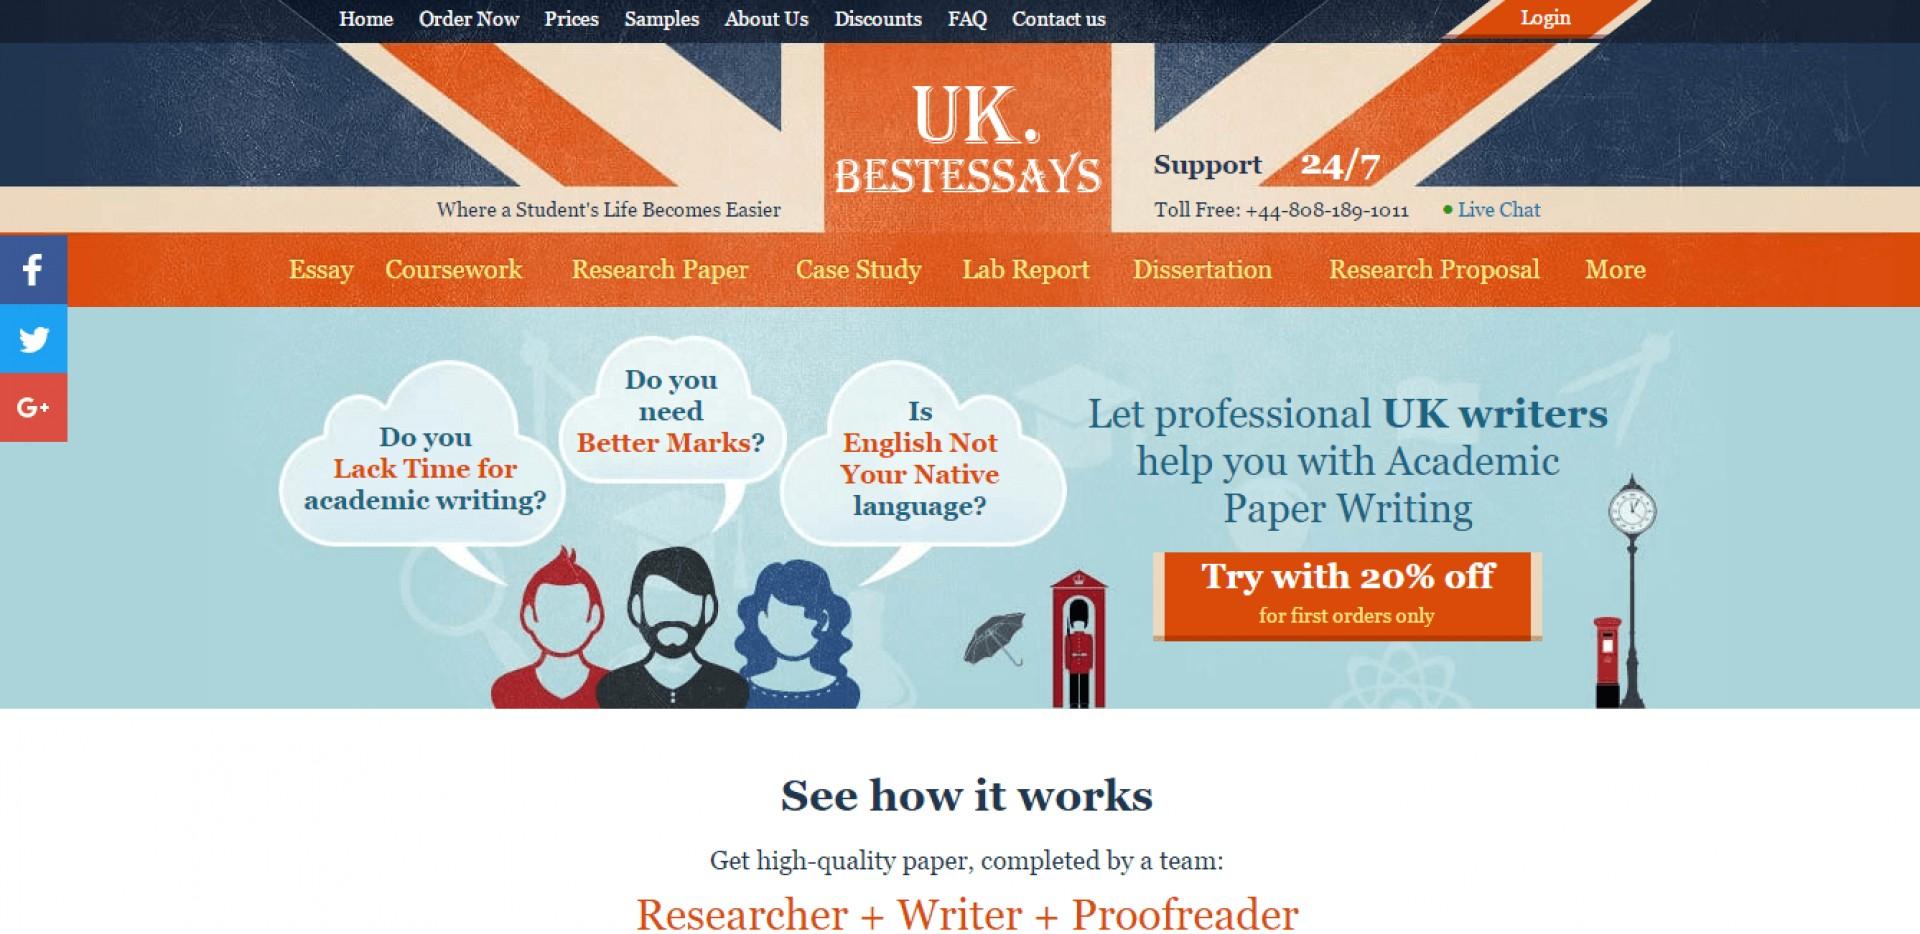 011 Ukbestessays Essay Writing Companies Uk Top Websites Sites 1920